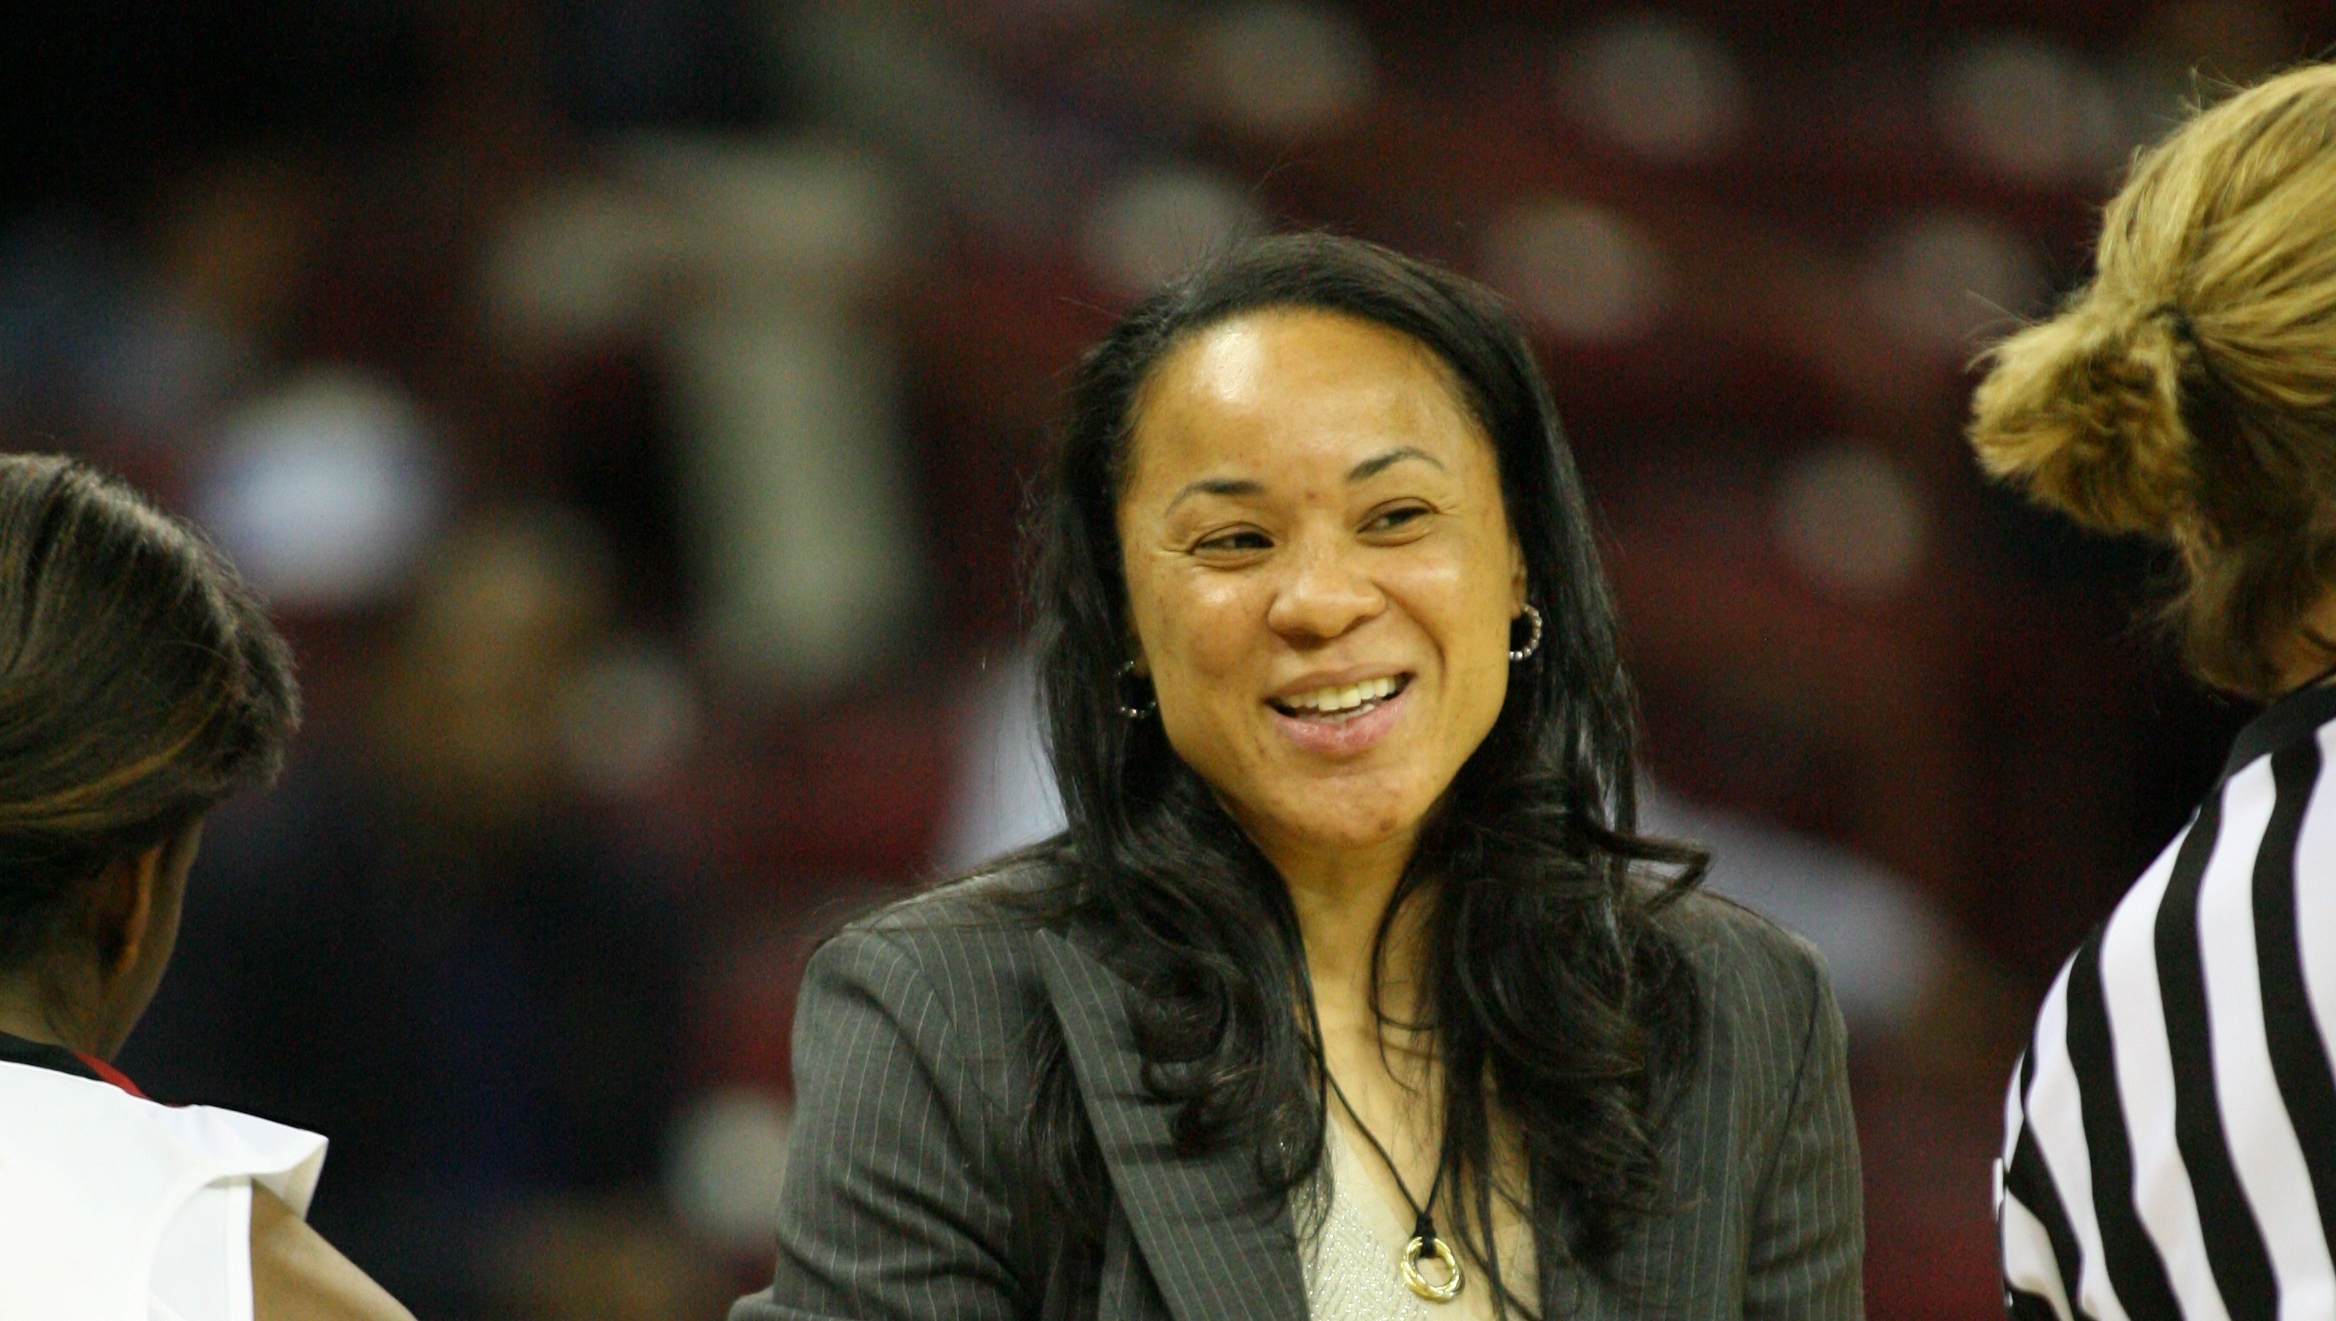 Dishin & Swishin January 19, 2012 podcast: Dawn Staley looks to change the culture of South Carolina basketball